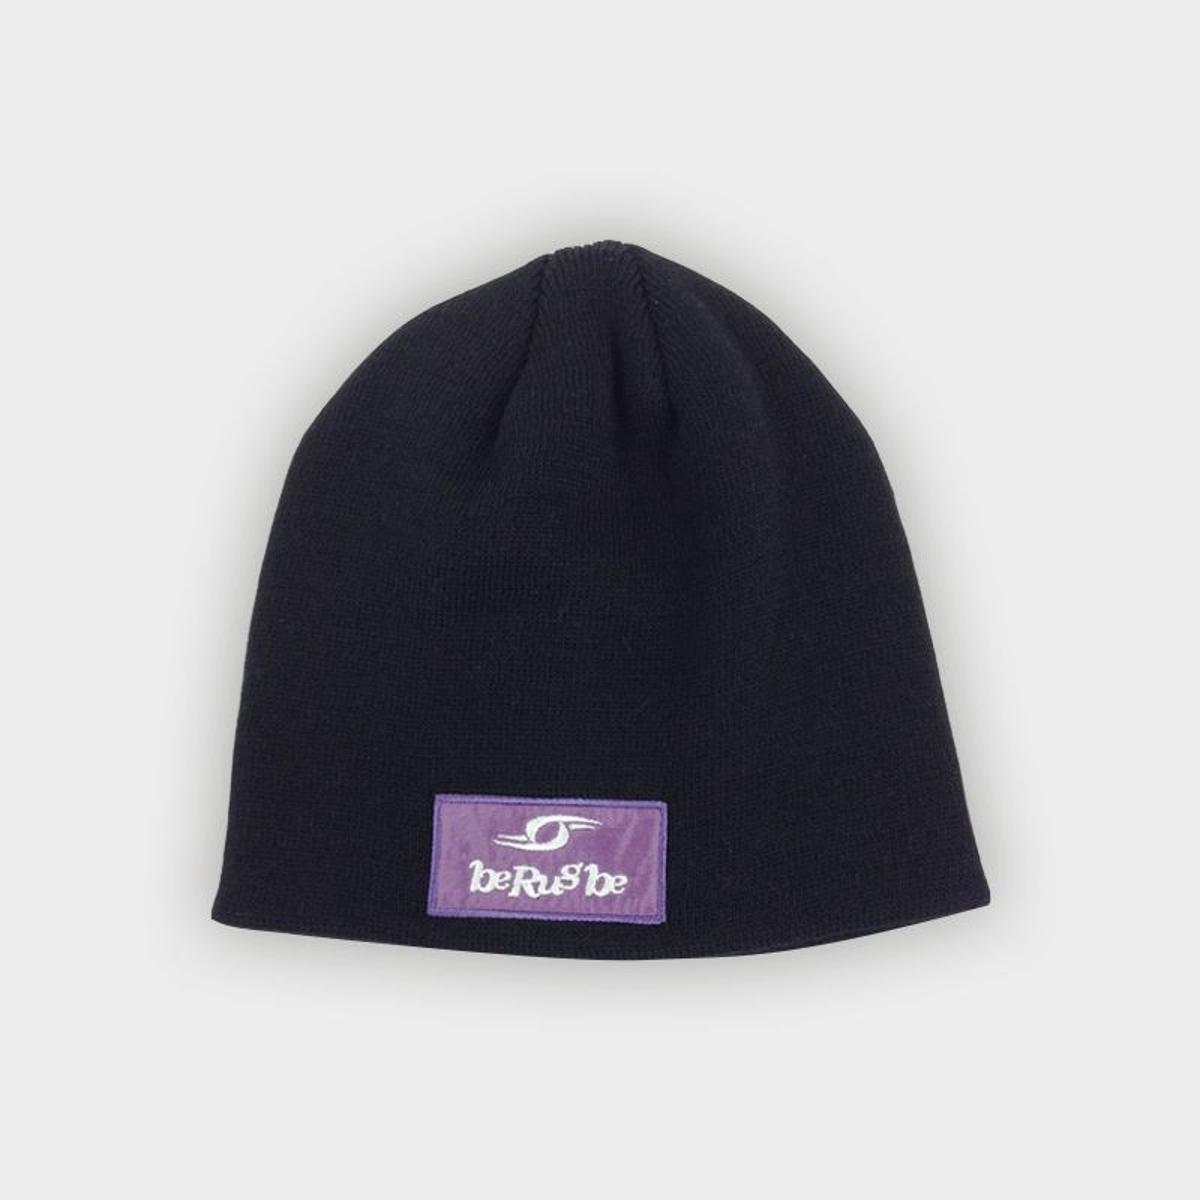 Bonnet Basic - Berugbe - Noir - U